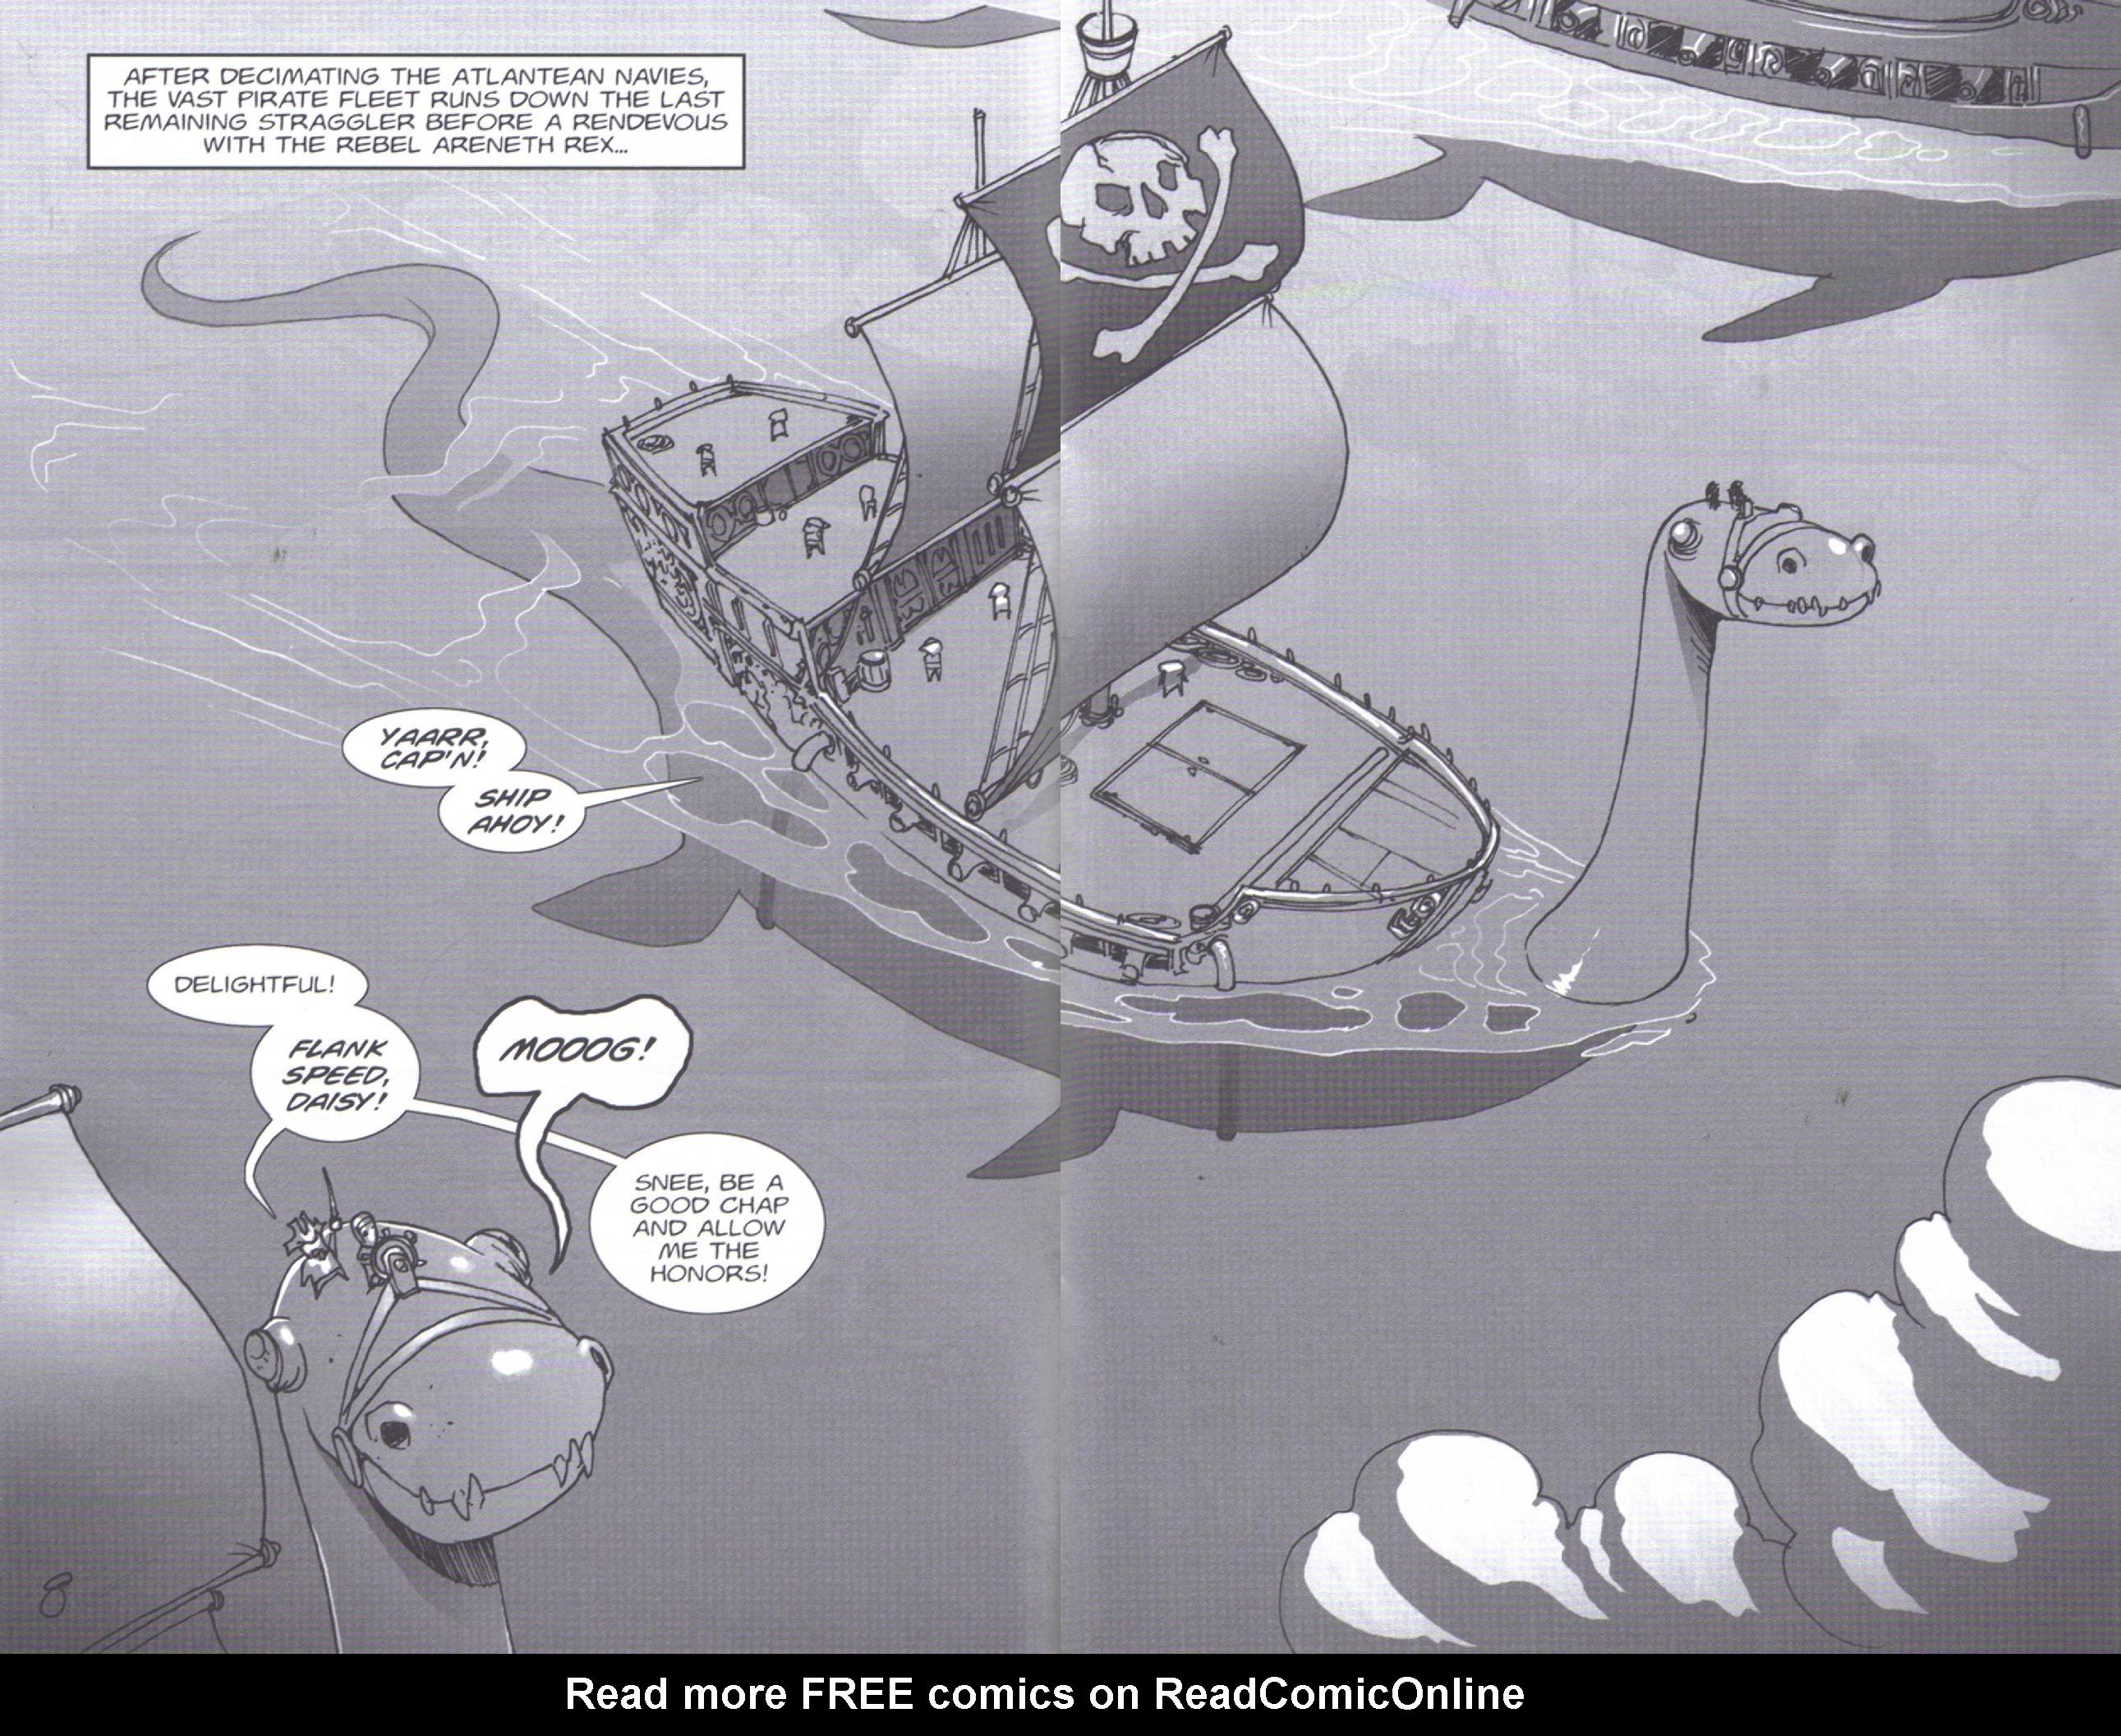 Read online Pirates vs. Ninjas: Global Harming comic -  Issue # Full - 9